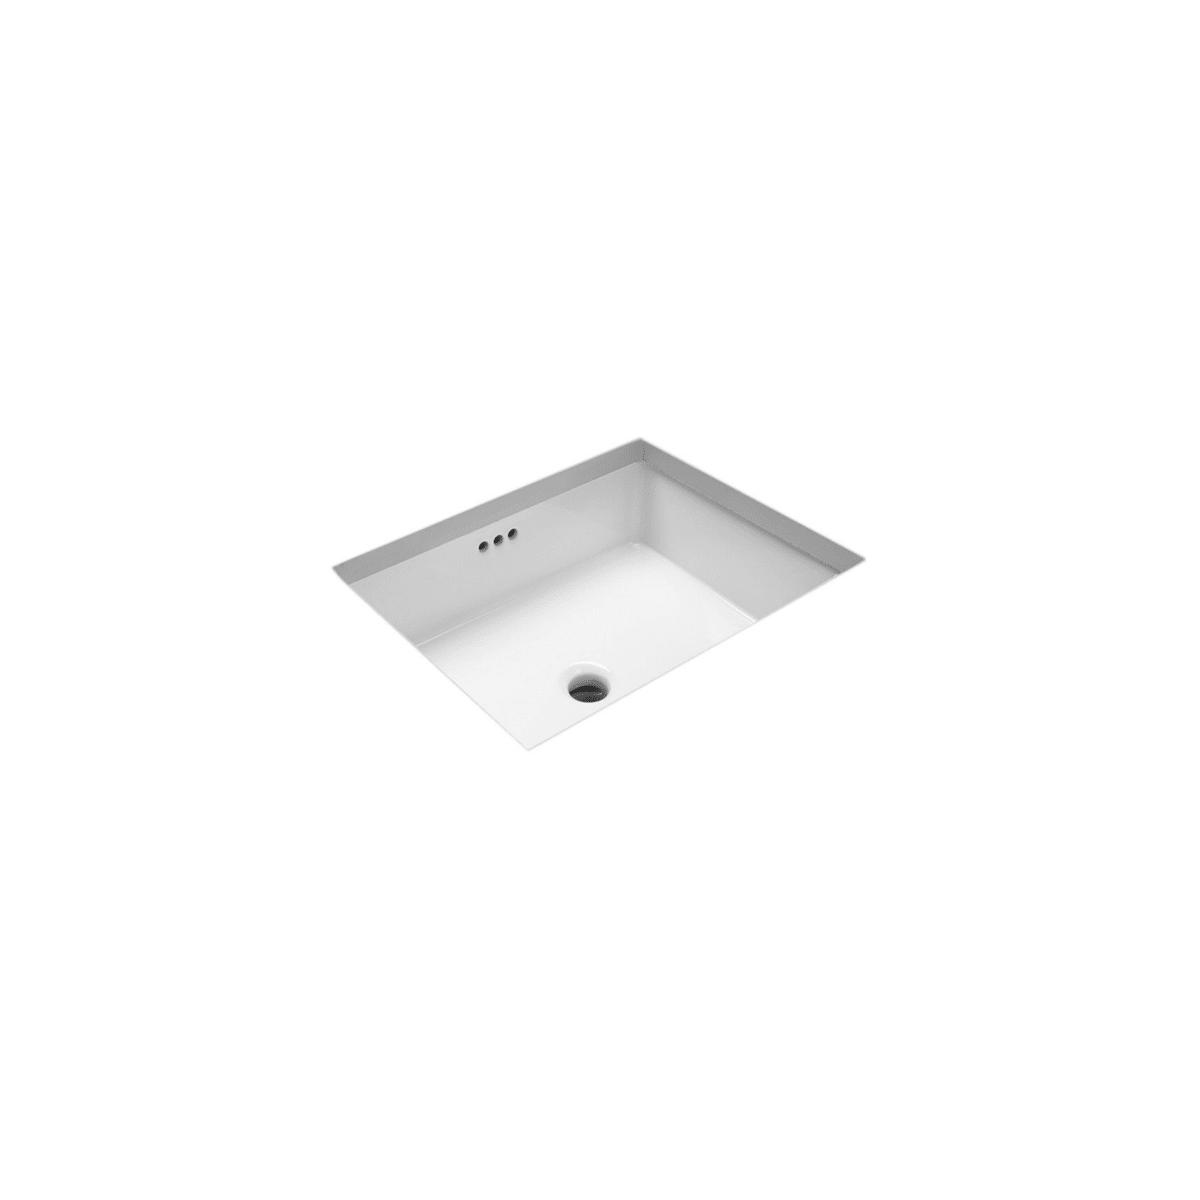 Proflo Pf1713u Undermount Bathroom Sink Sink Home Remodeling